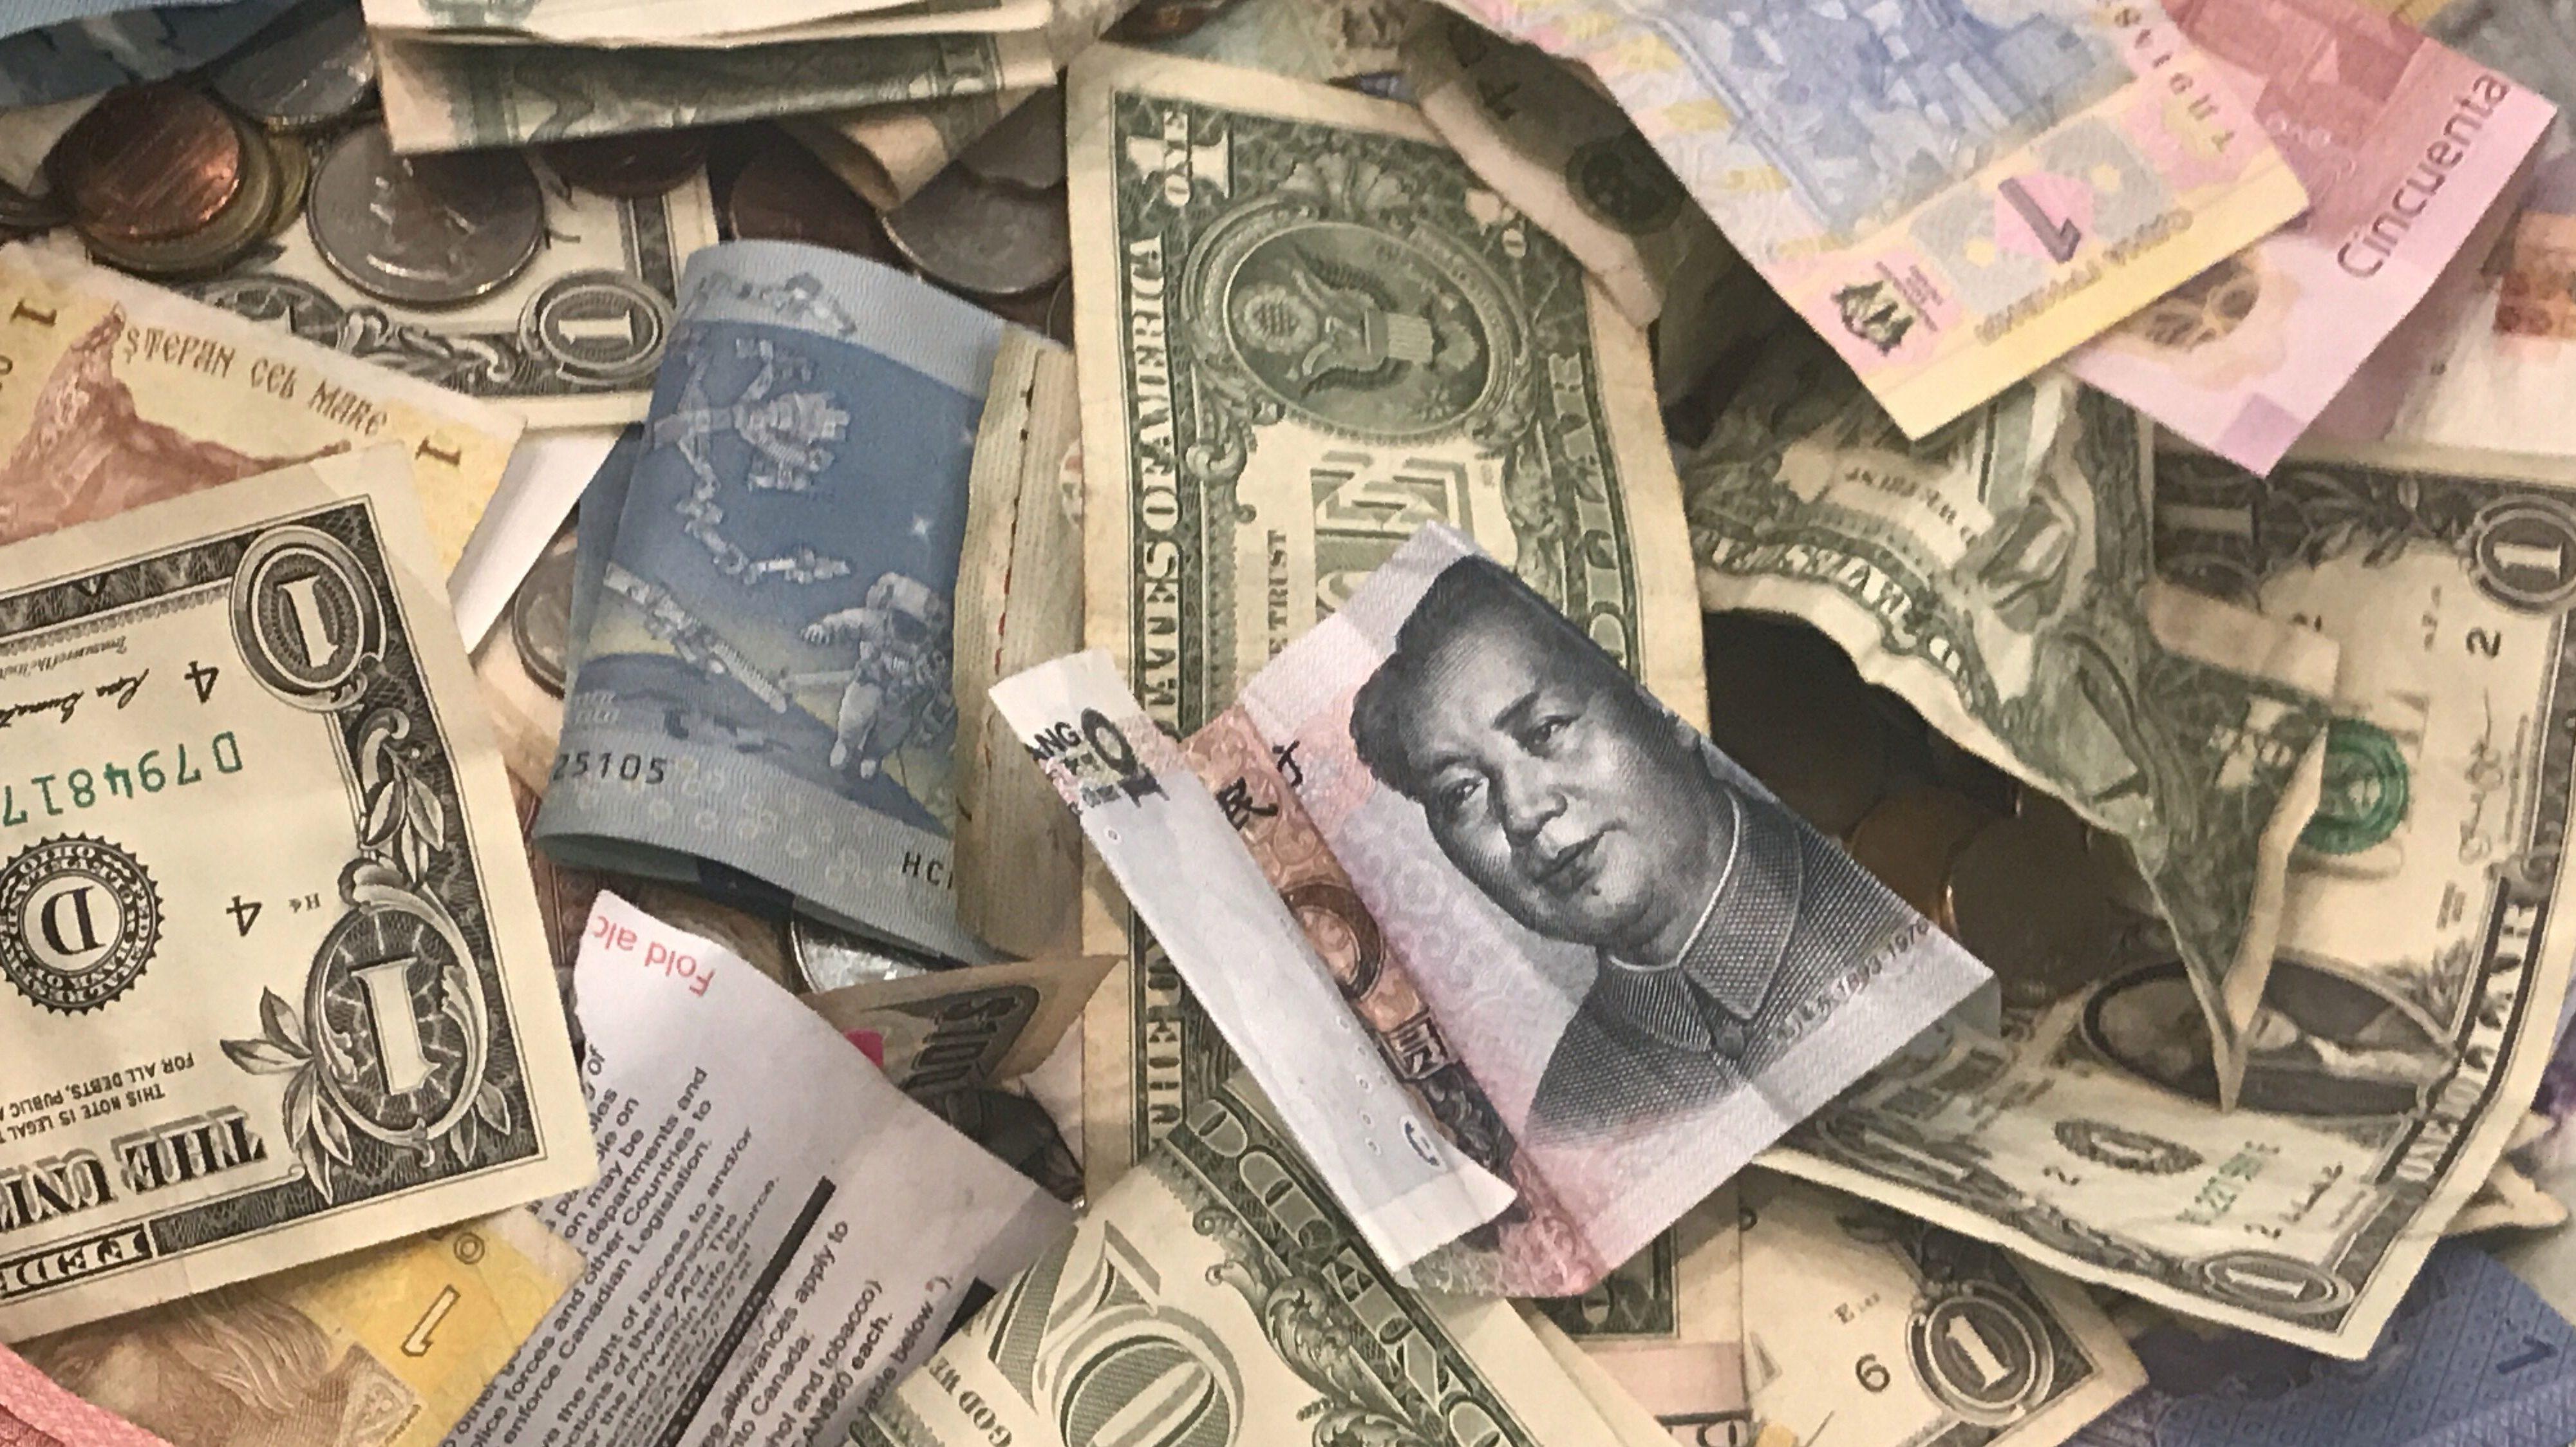 Image of various international currencies